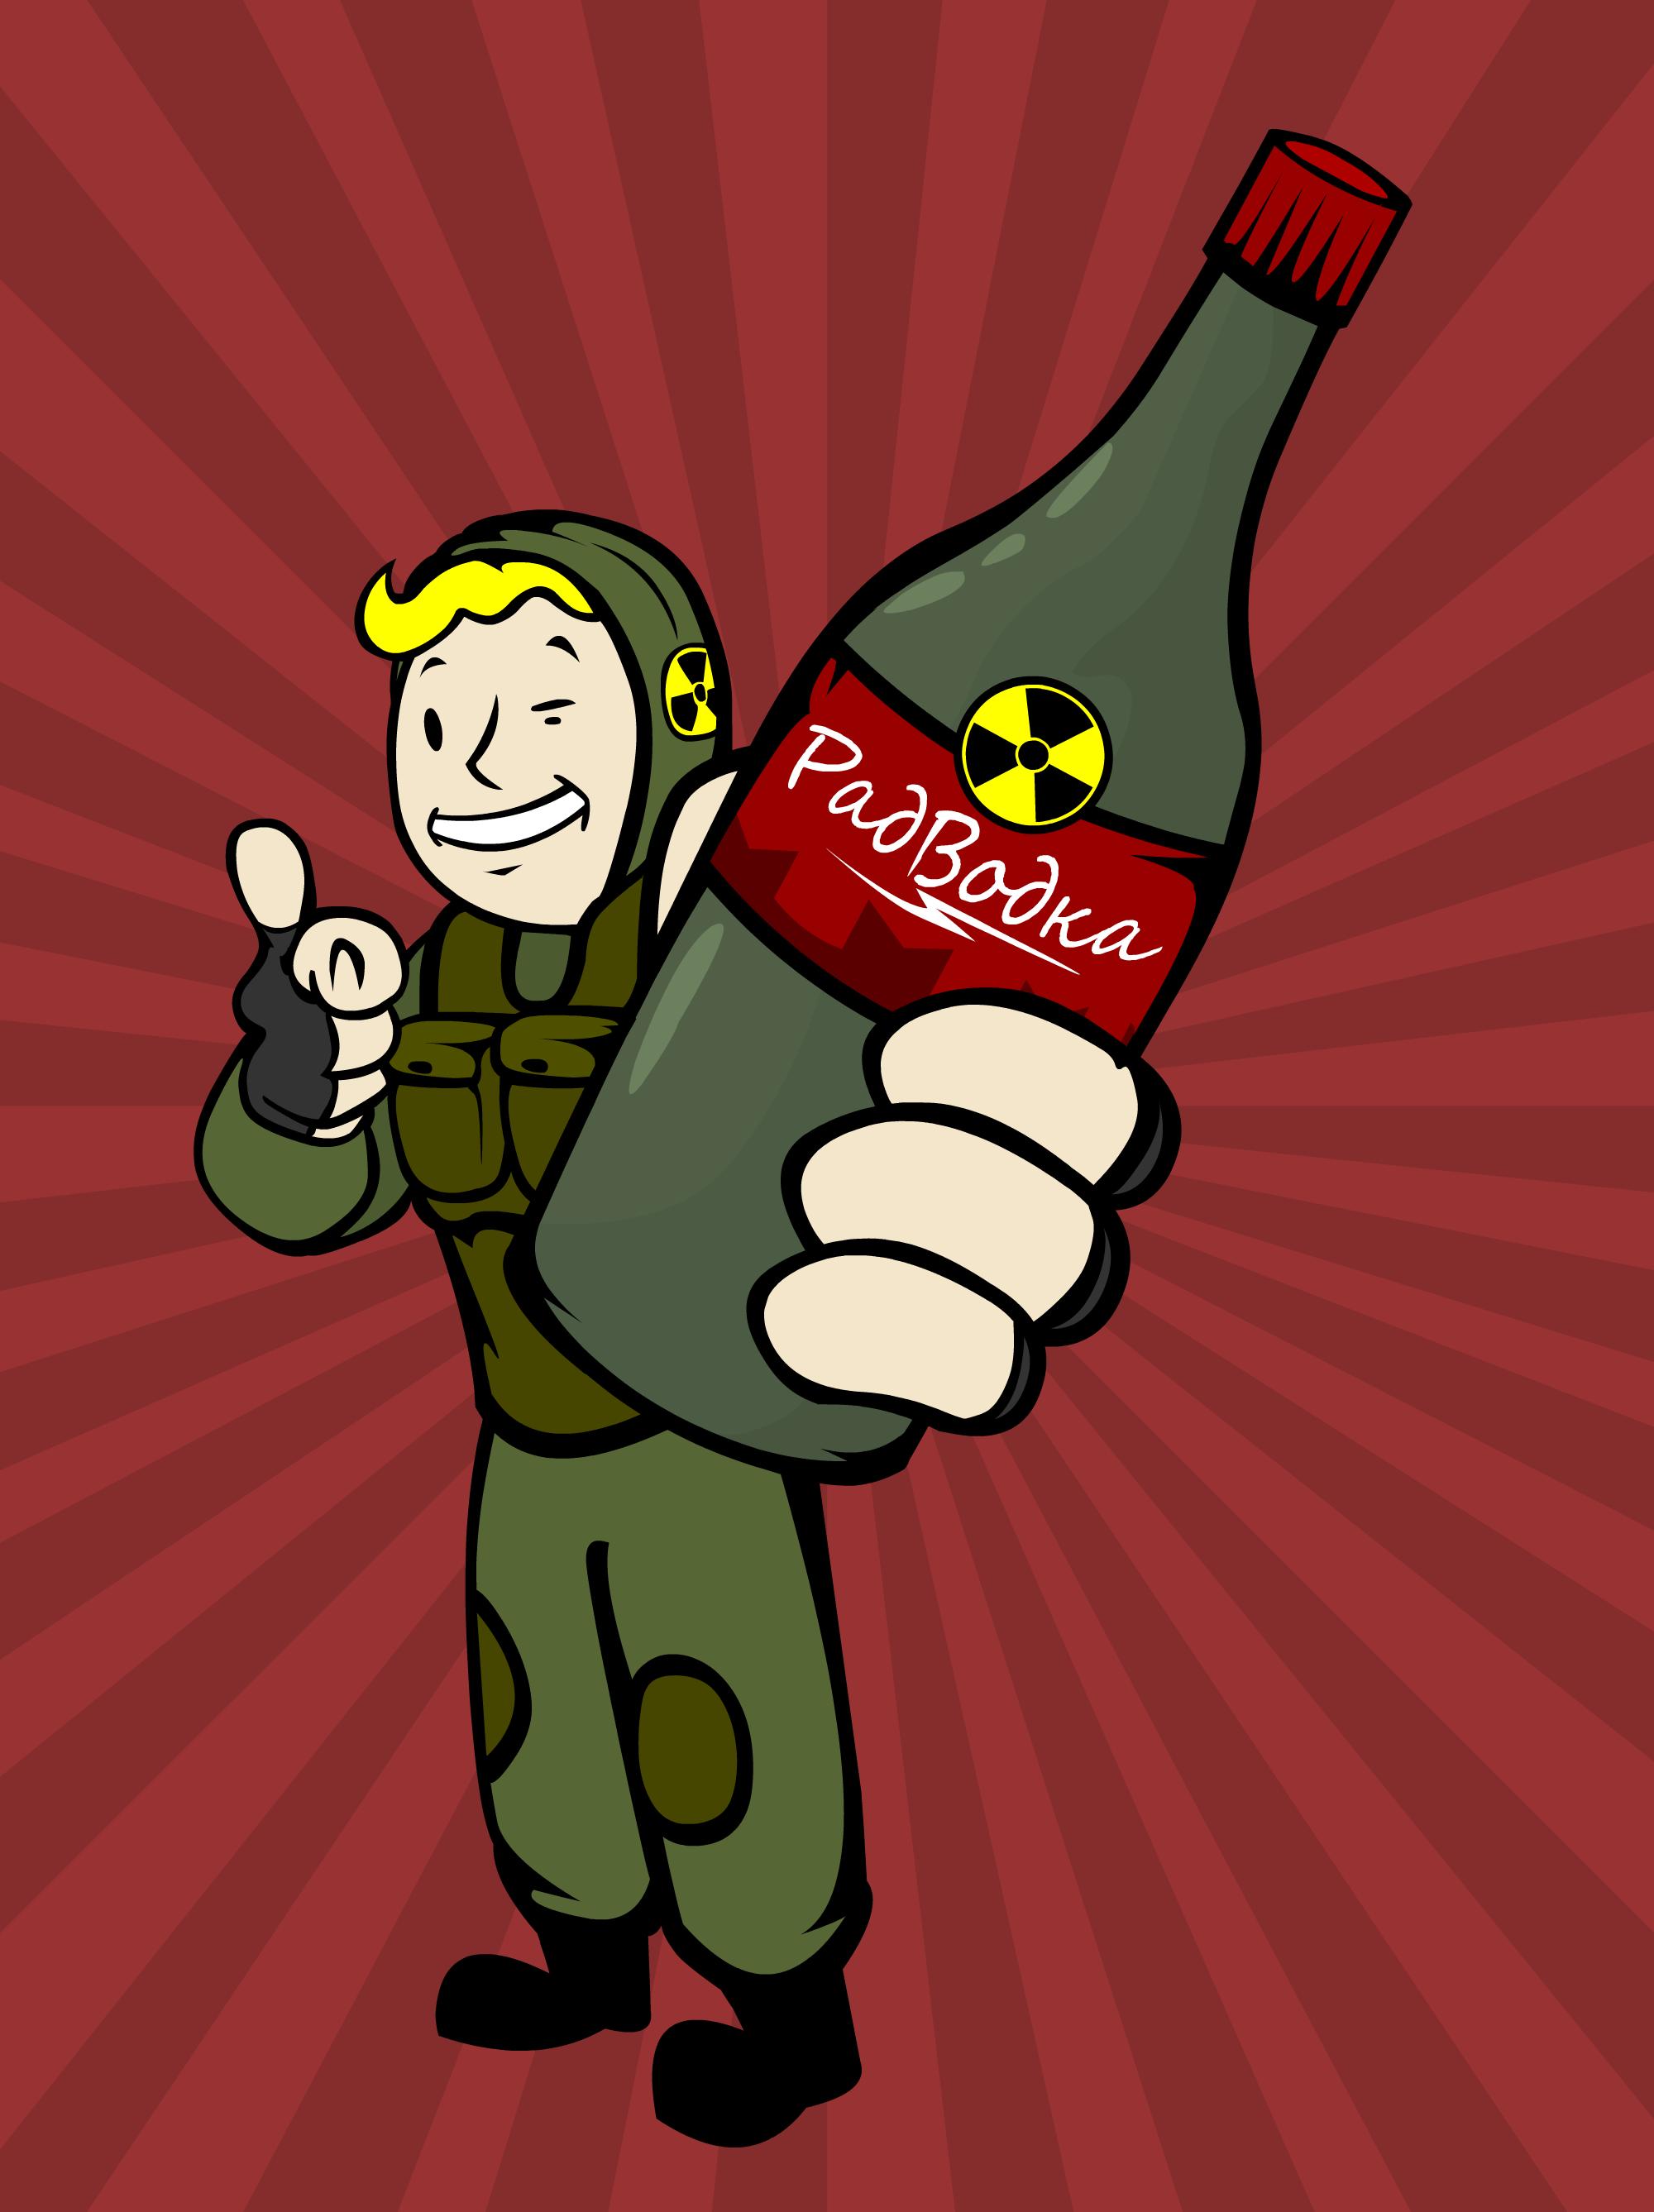 S.T.A.L.K.E.R - RadVodka